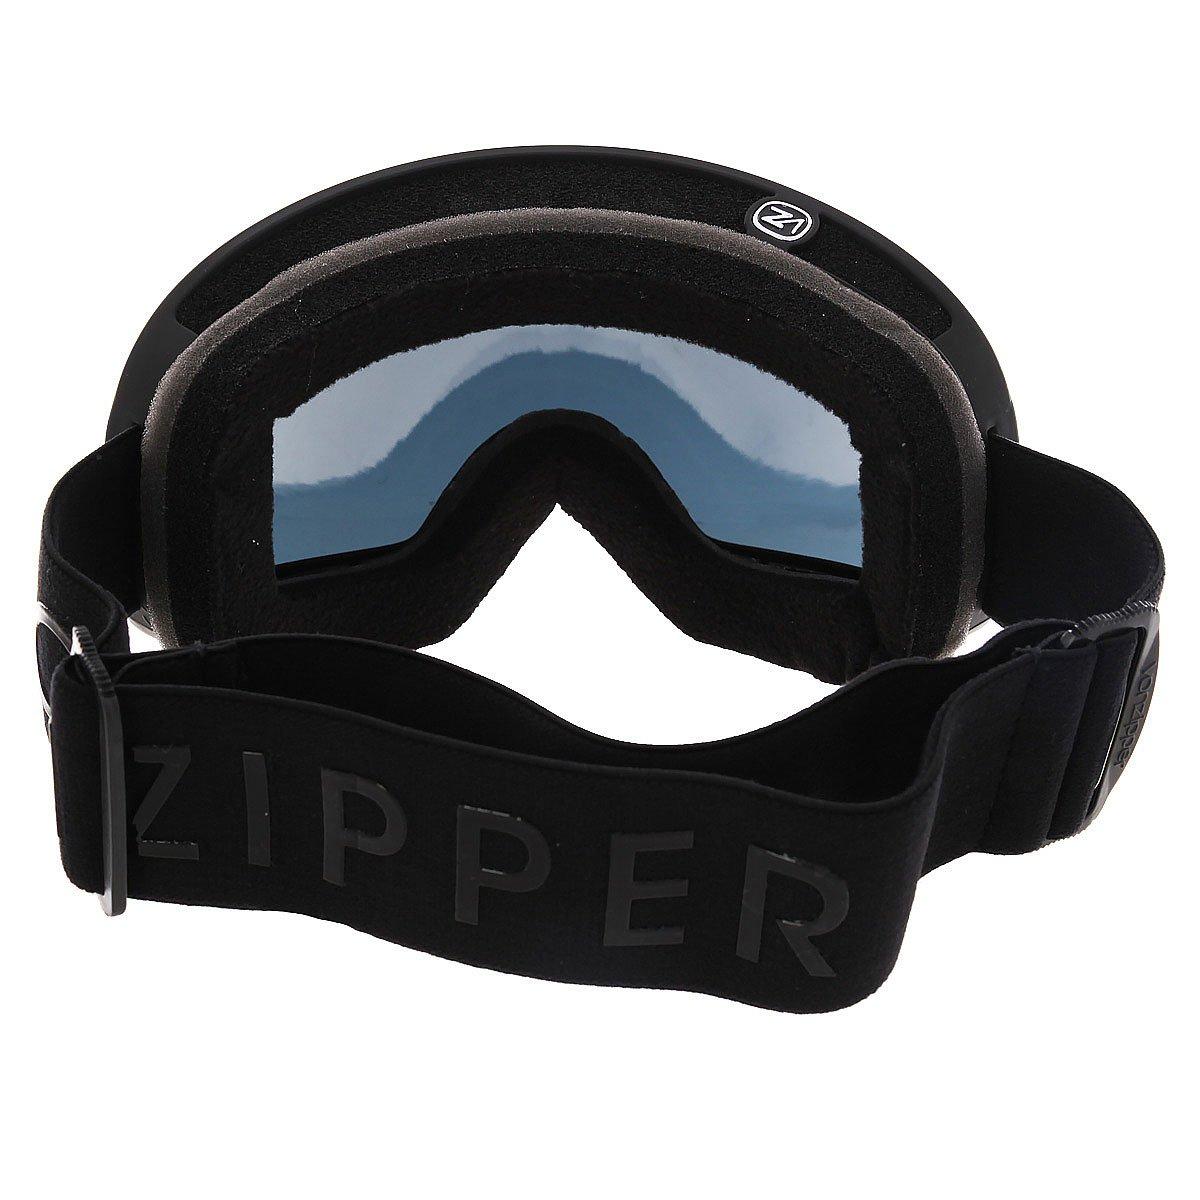 Маска для сноуборда Von Zipper Fishbowl Black Satin/Blackout